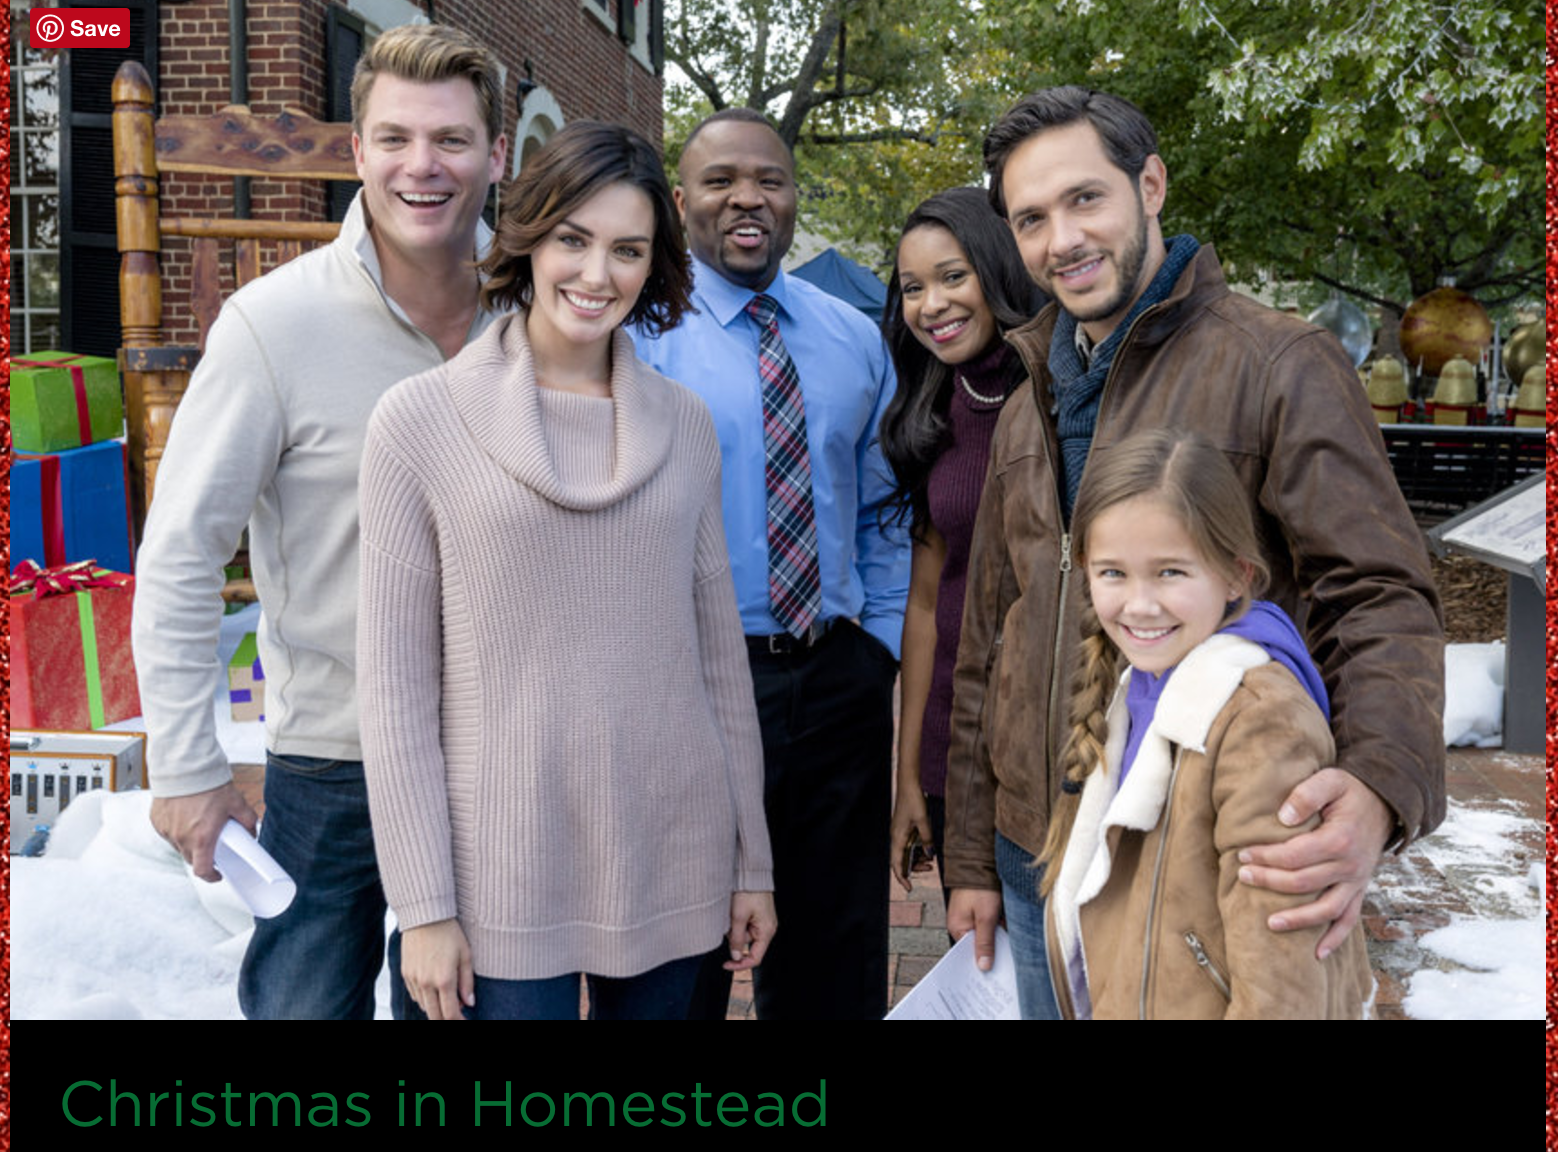 Taylor Cole Christmas In Homestead.Christmas In Homestead With Taylor Cole And Michael Rady